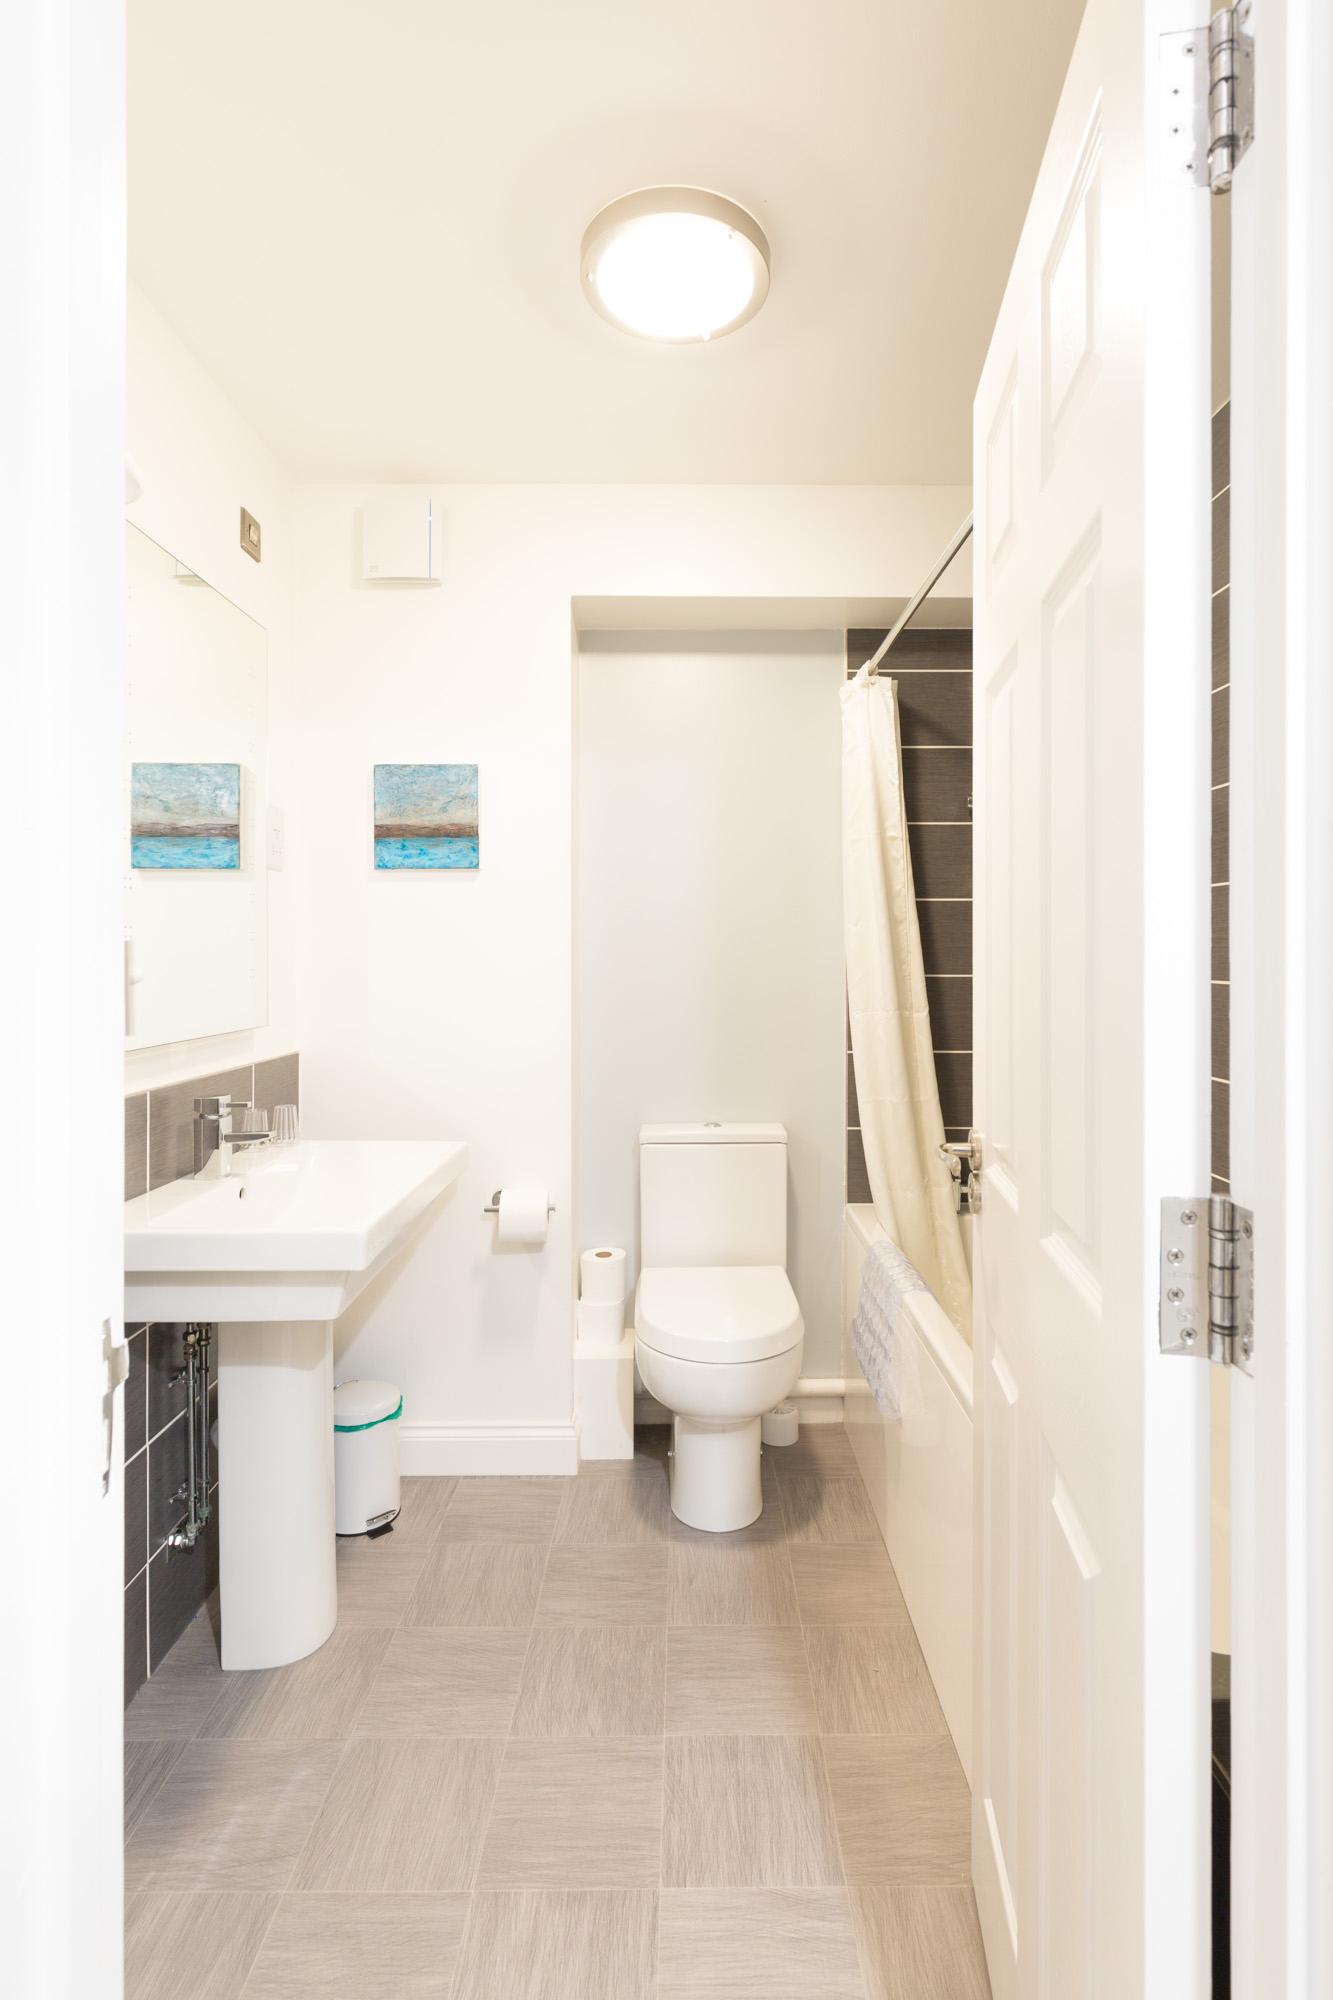 Toothbrush Apartments Property Photograpy Masons Close-5.jpg